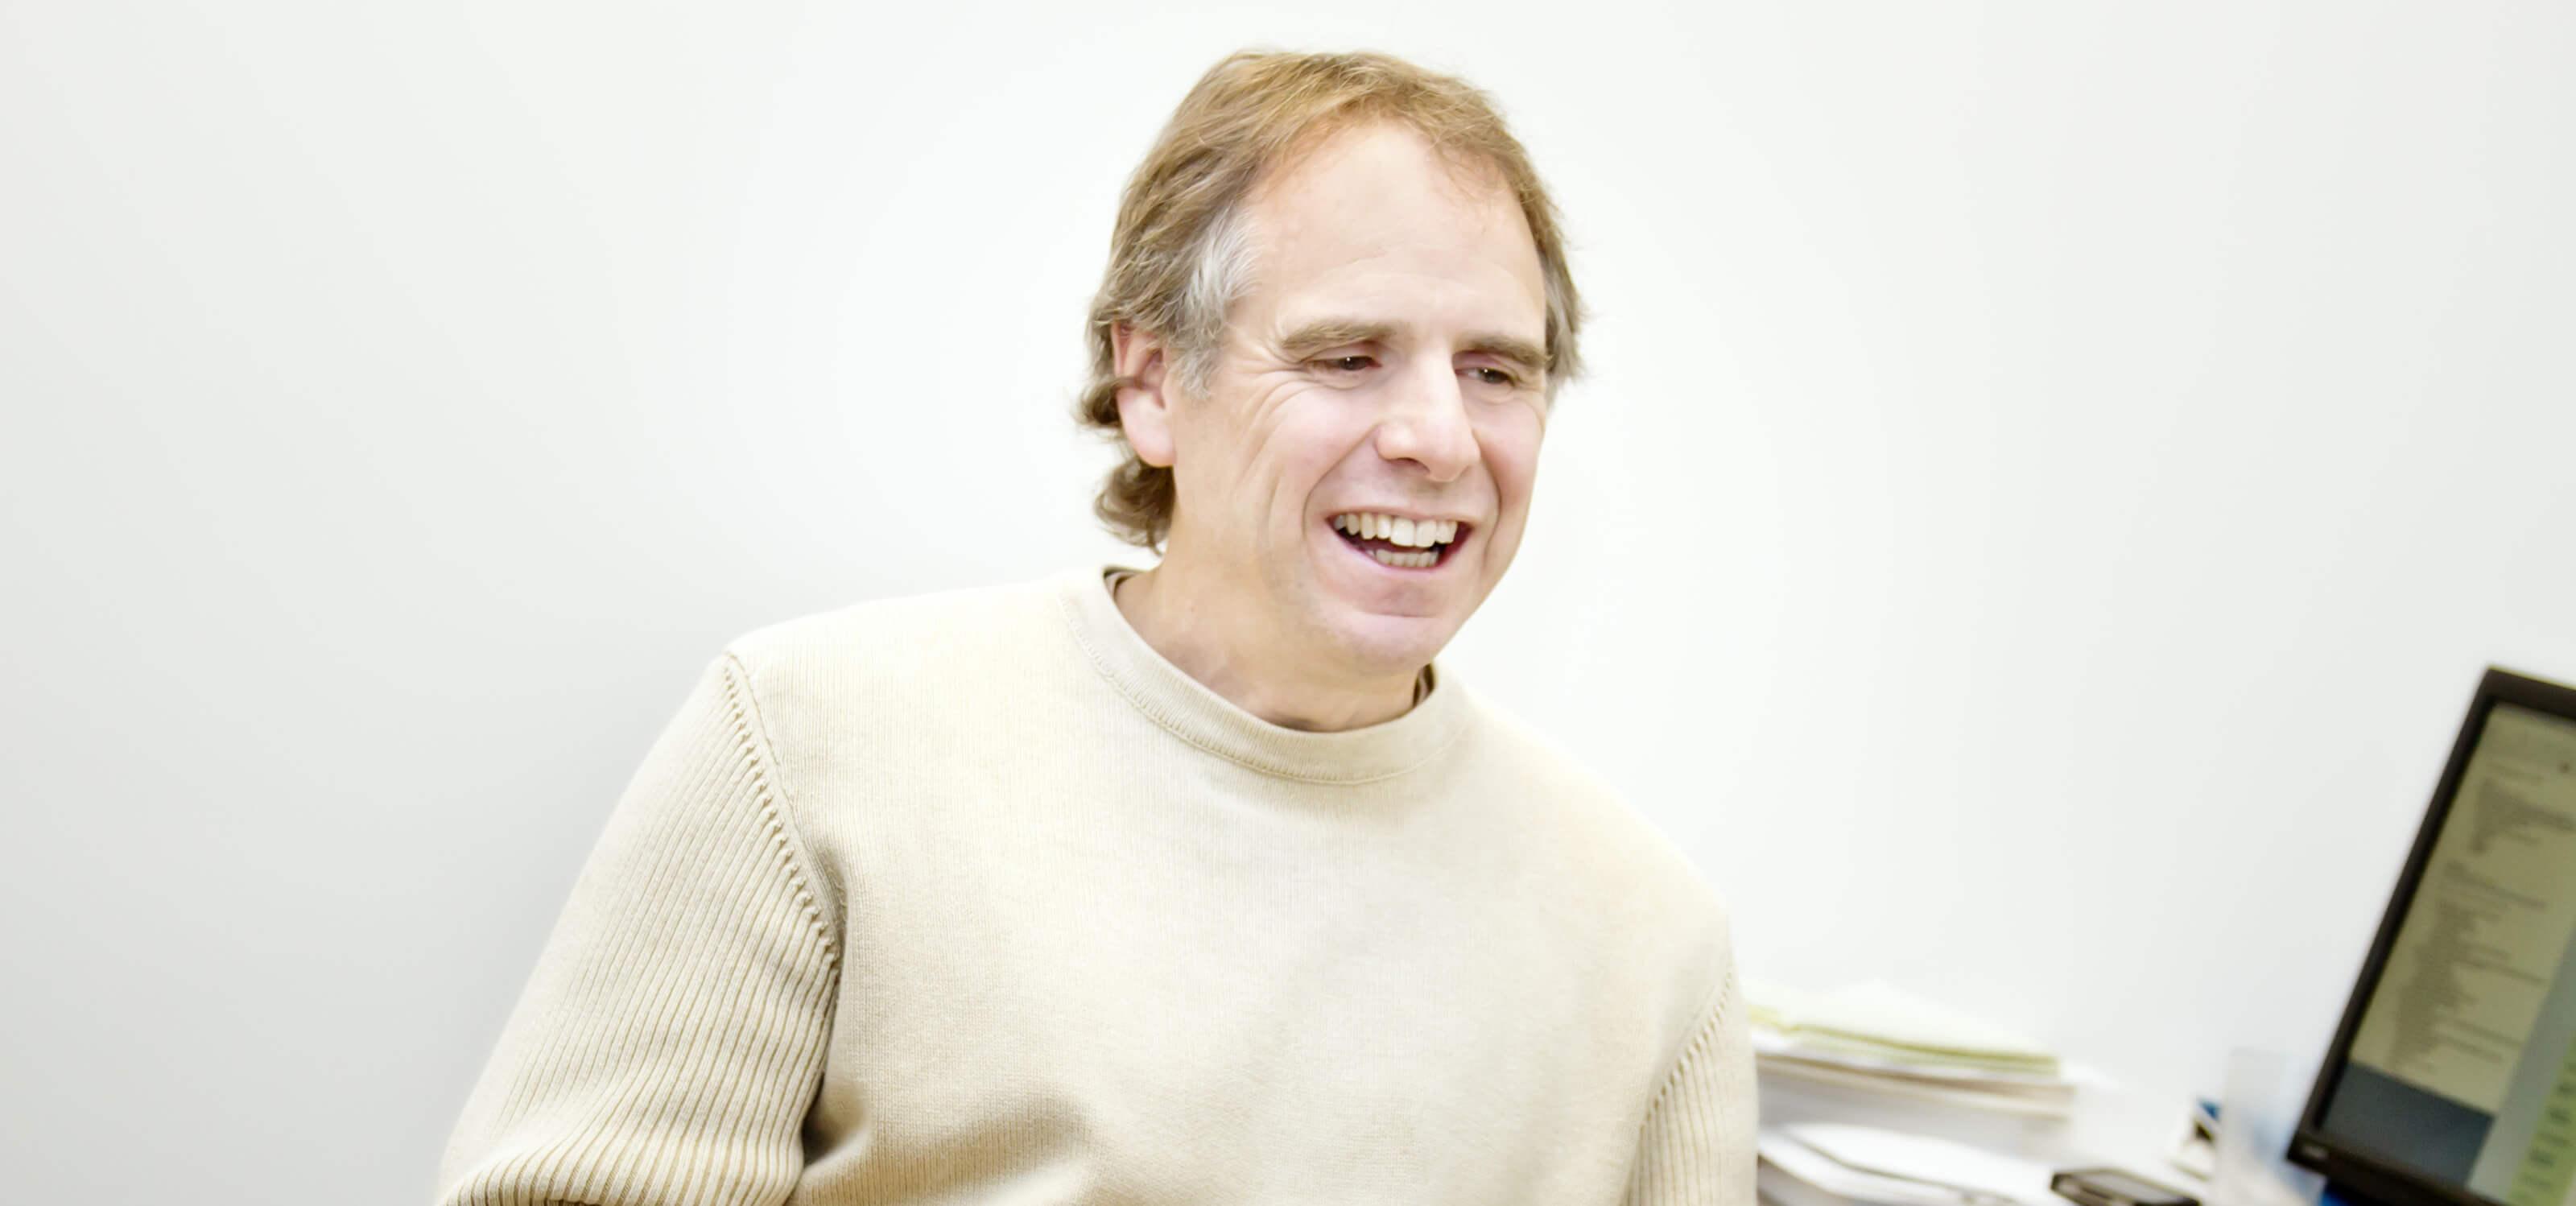 DigiPen digital arts lecturer Mark Henne smiling in his DigiPen office